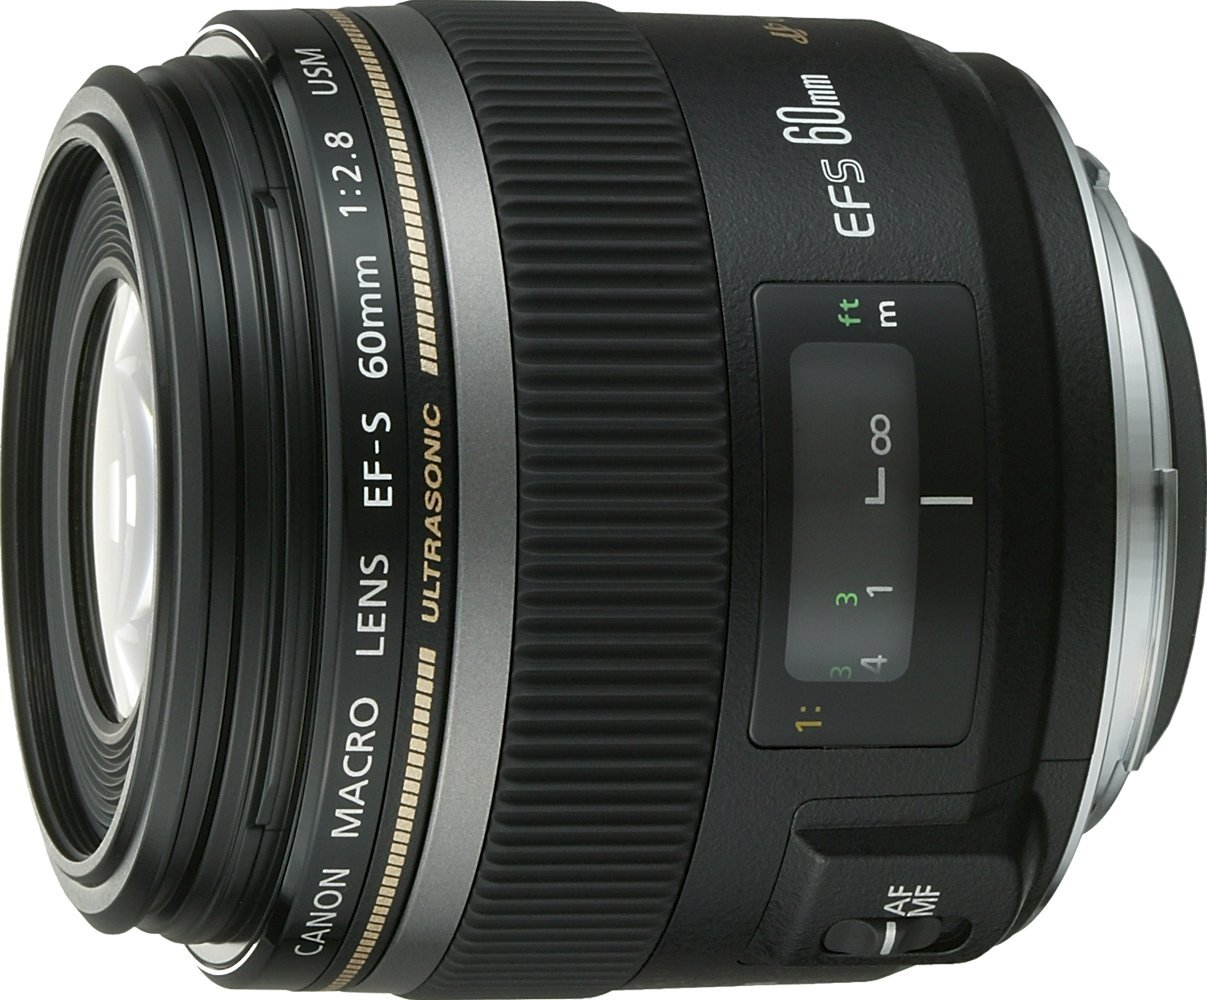 Canon Macro USM Objetivo para Canon distancia focal fija mm apertura f